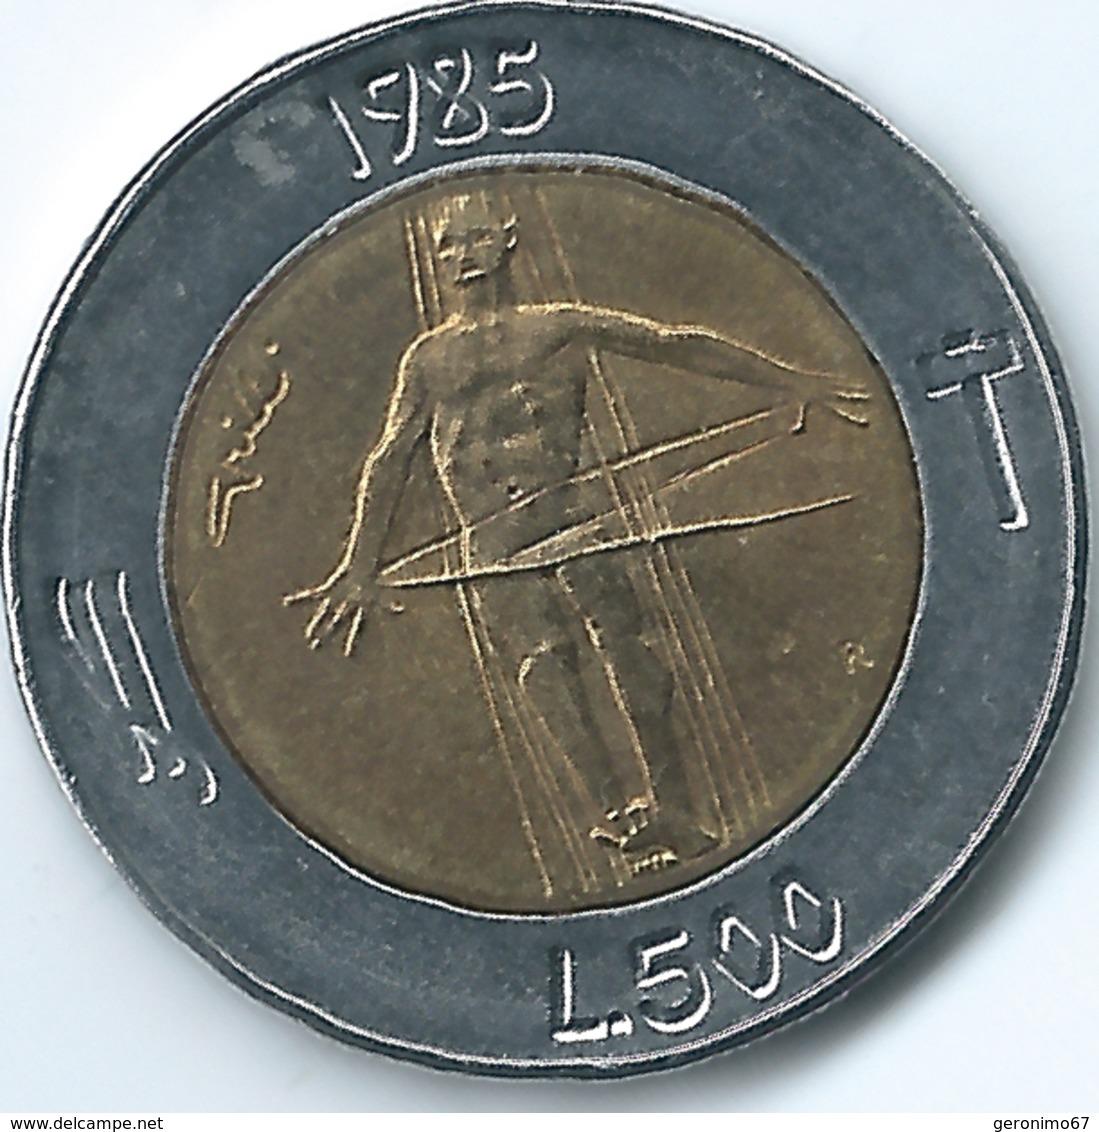 San Marino - 1985 - 500 Lira - KM181 - San Marino